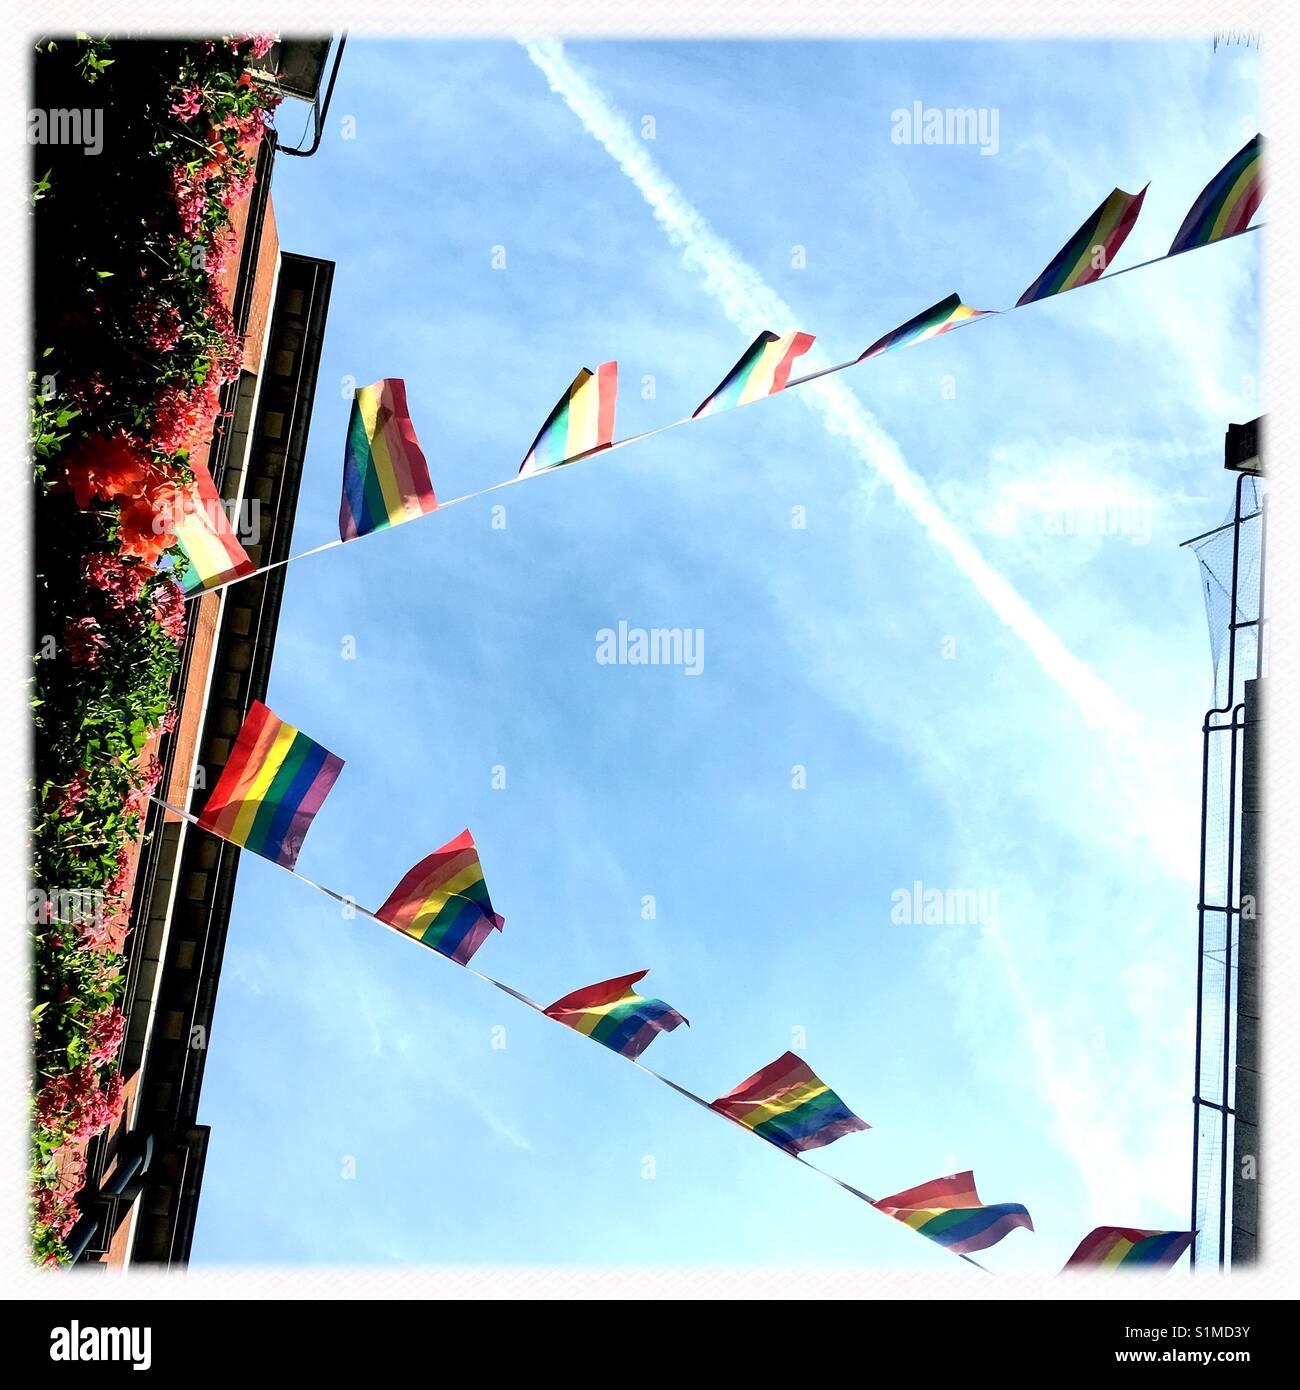 Rainbow pride flags - Stock Image